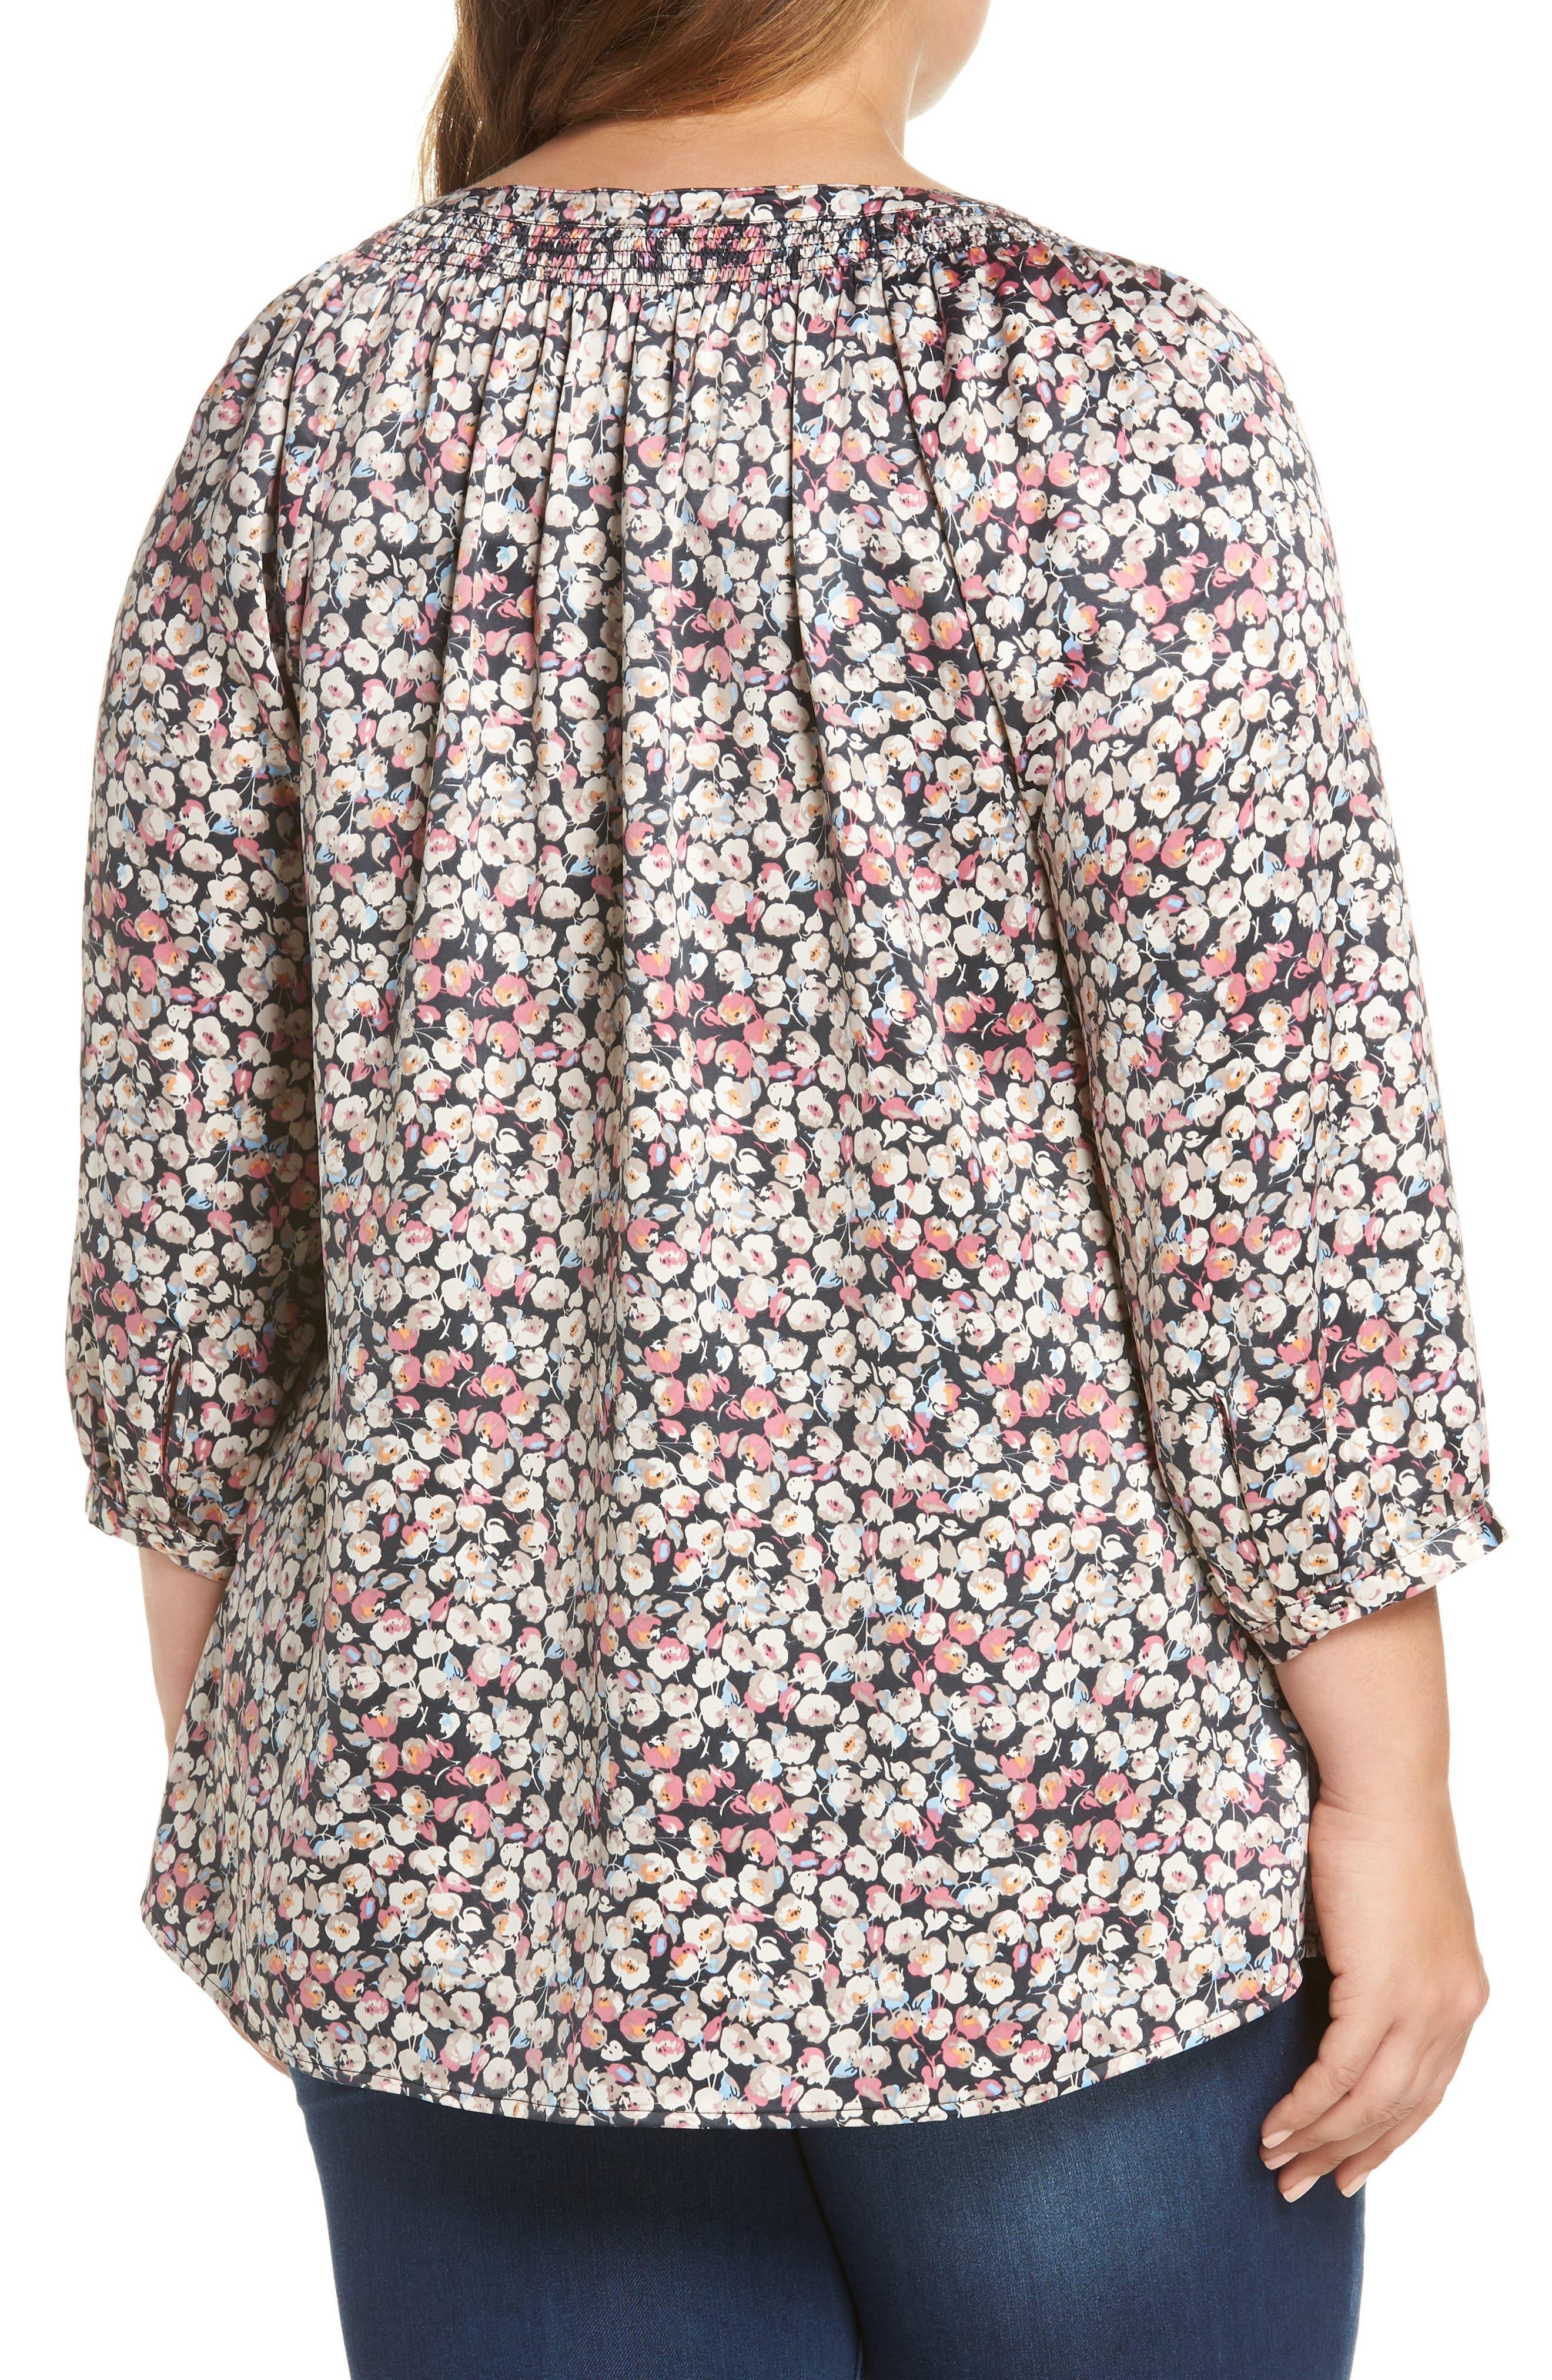 Floral Blouson Sleeve Blouse,                             Alternate thumbnail 2, color,                             B244n Mauve